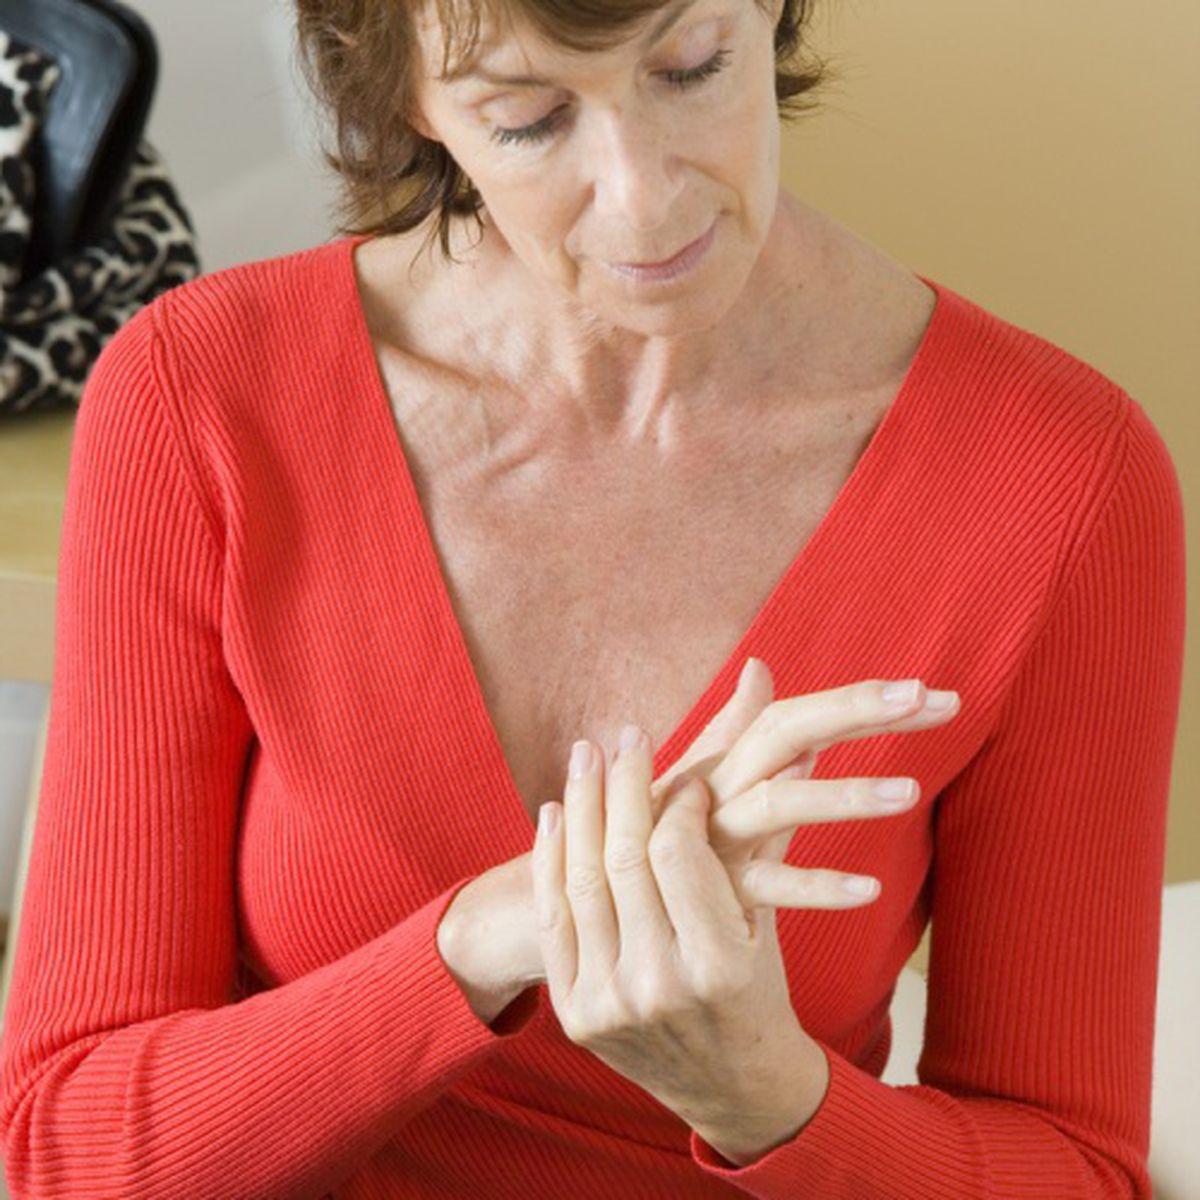 tratamentul artrozei cu naturopatie)